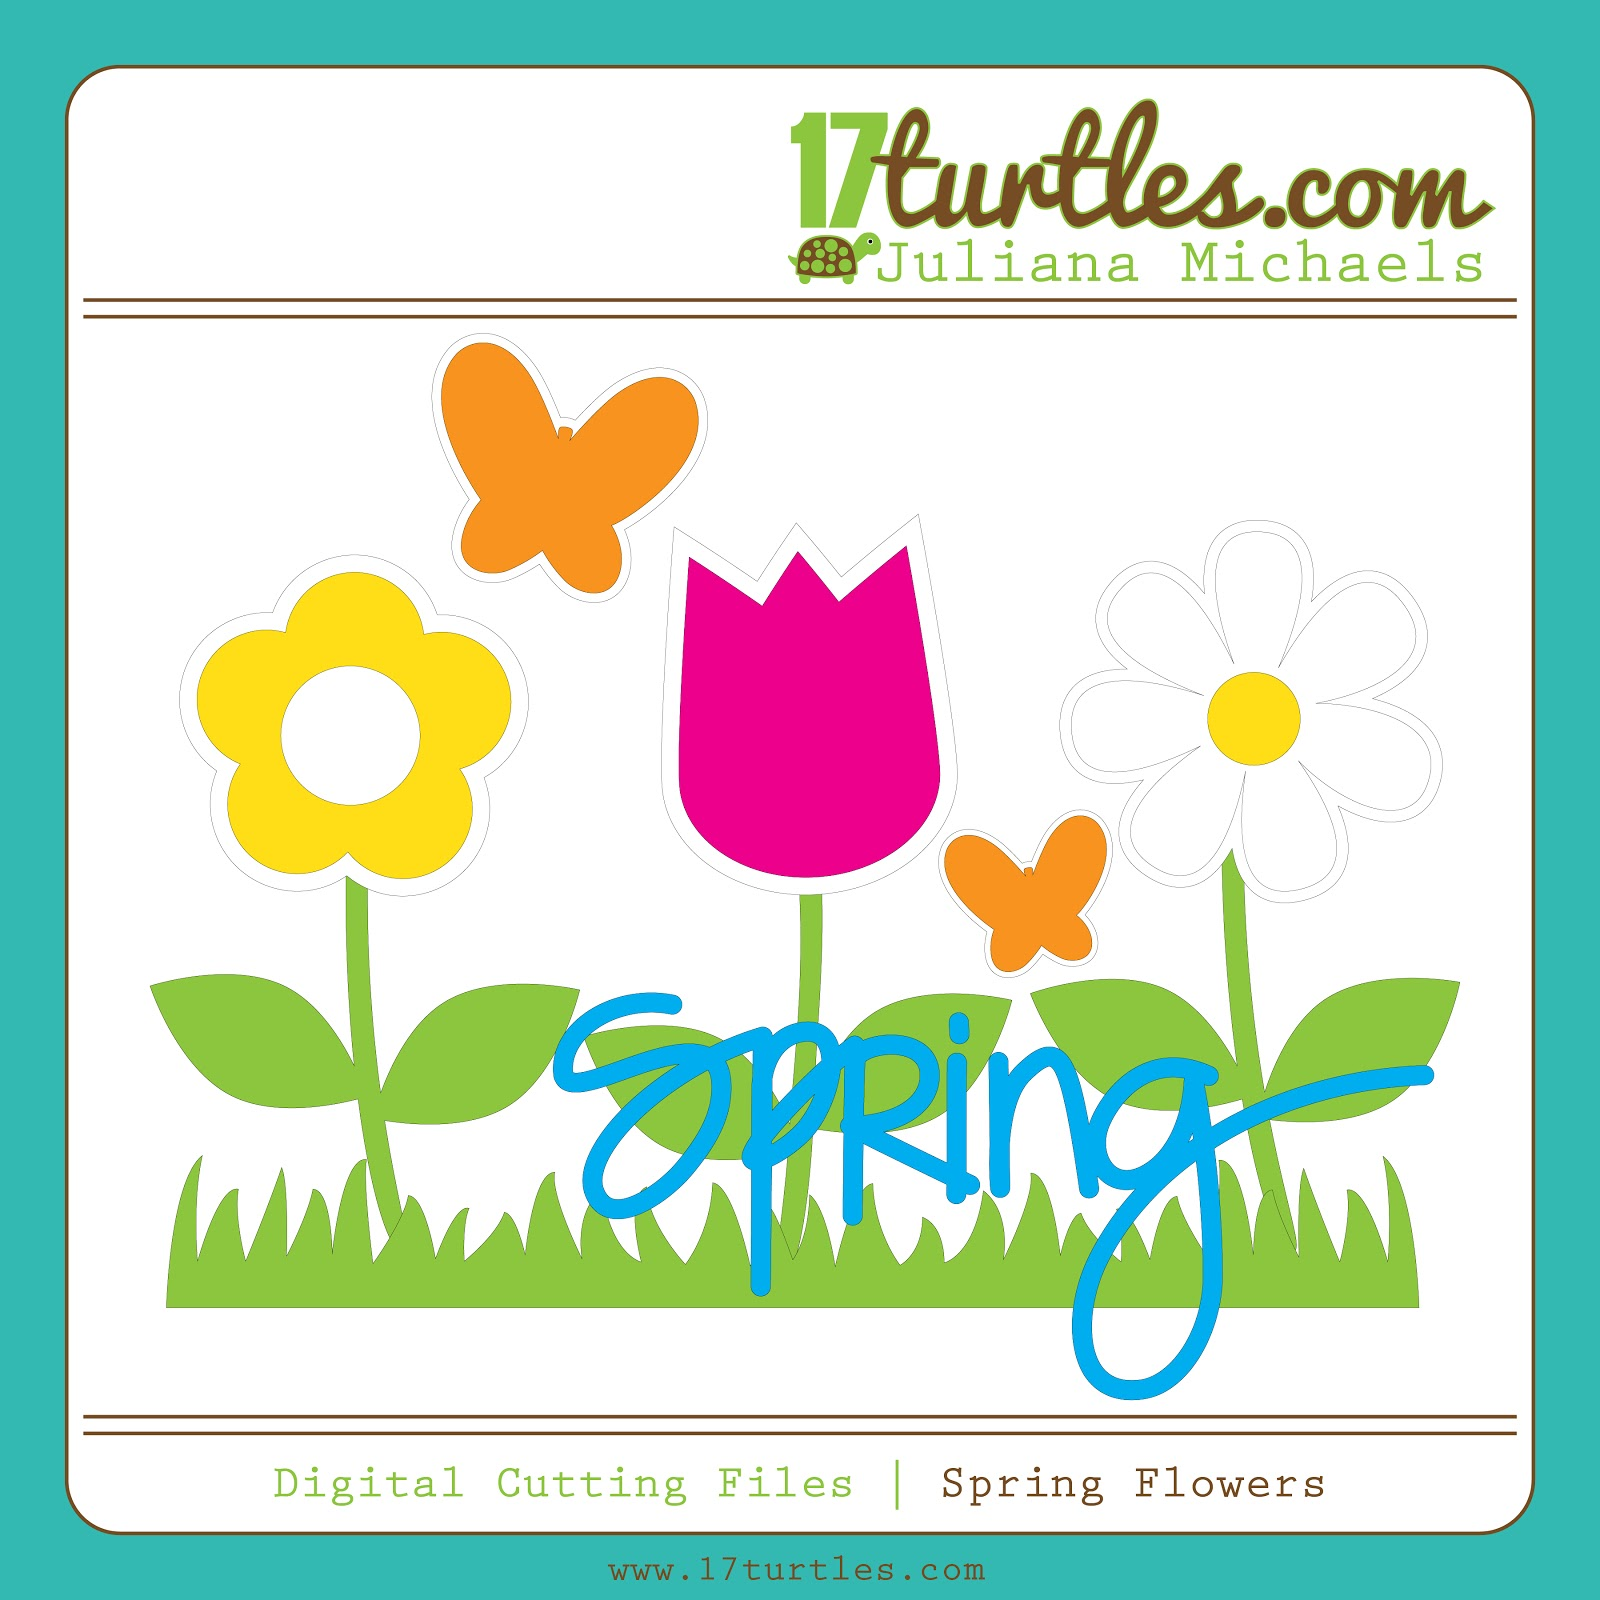 http://1.bp.blogspot.com/-q6R0aoybZsQ/U1aNgg07vUI/AAAAAAAAQzU/n8npCt5cyrc/s1600/Spring-Flowers.jpg